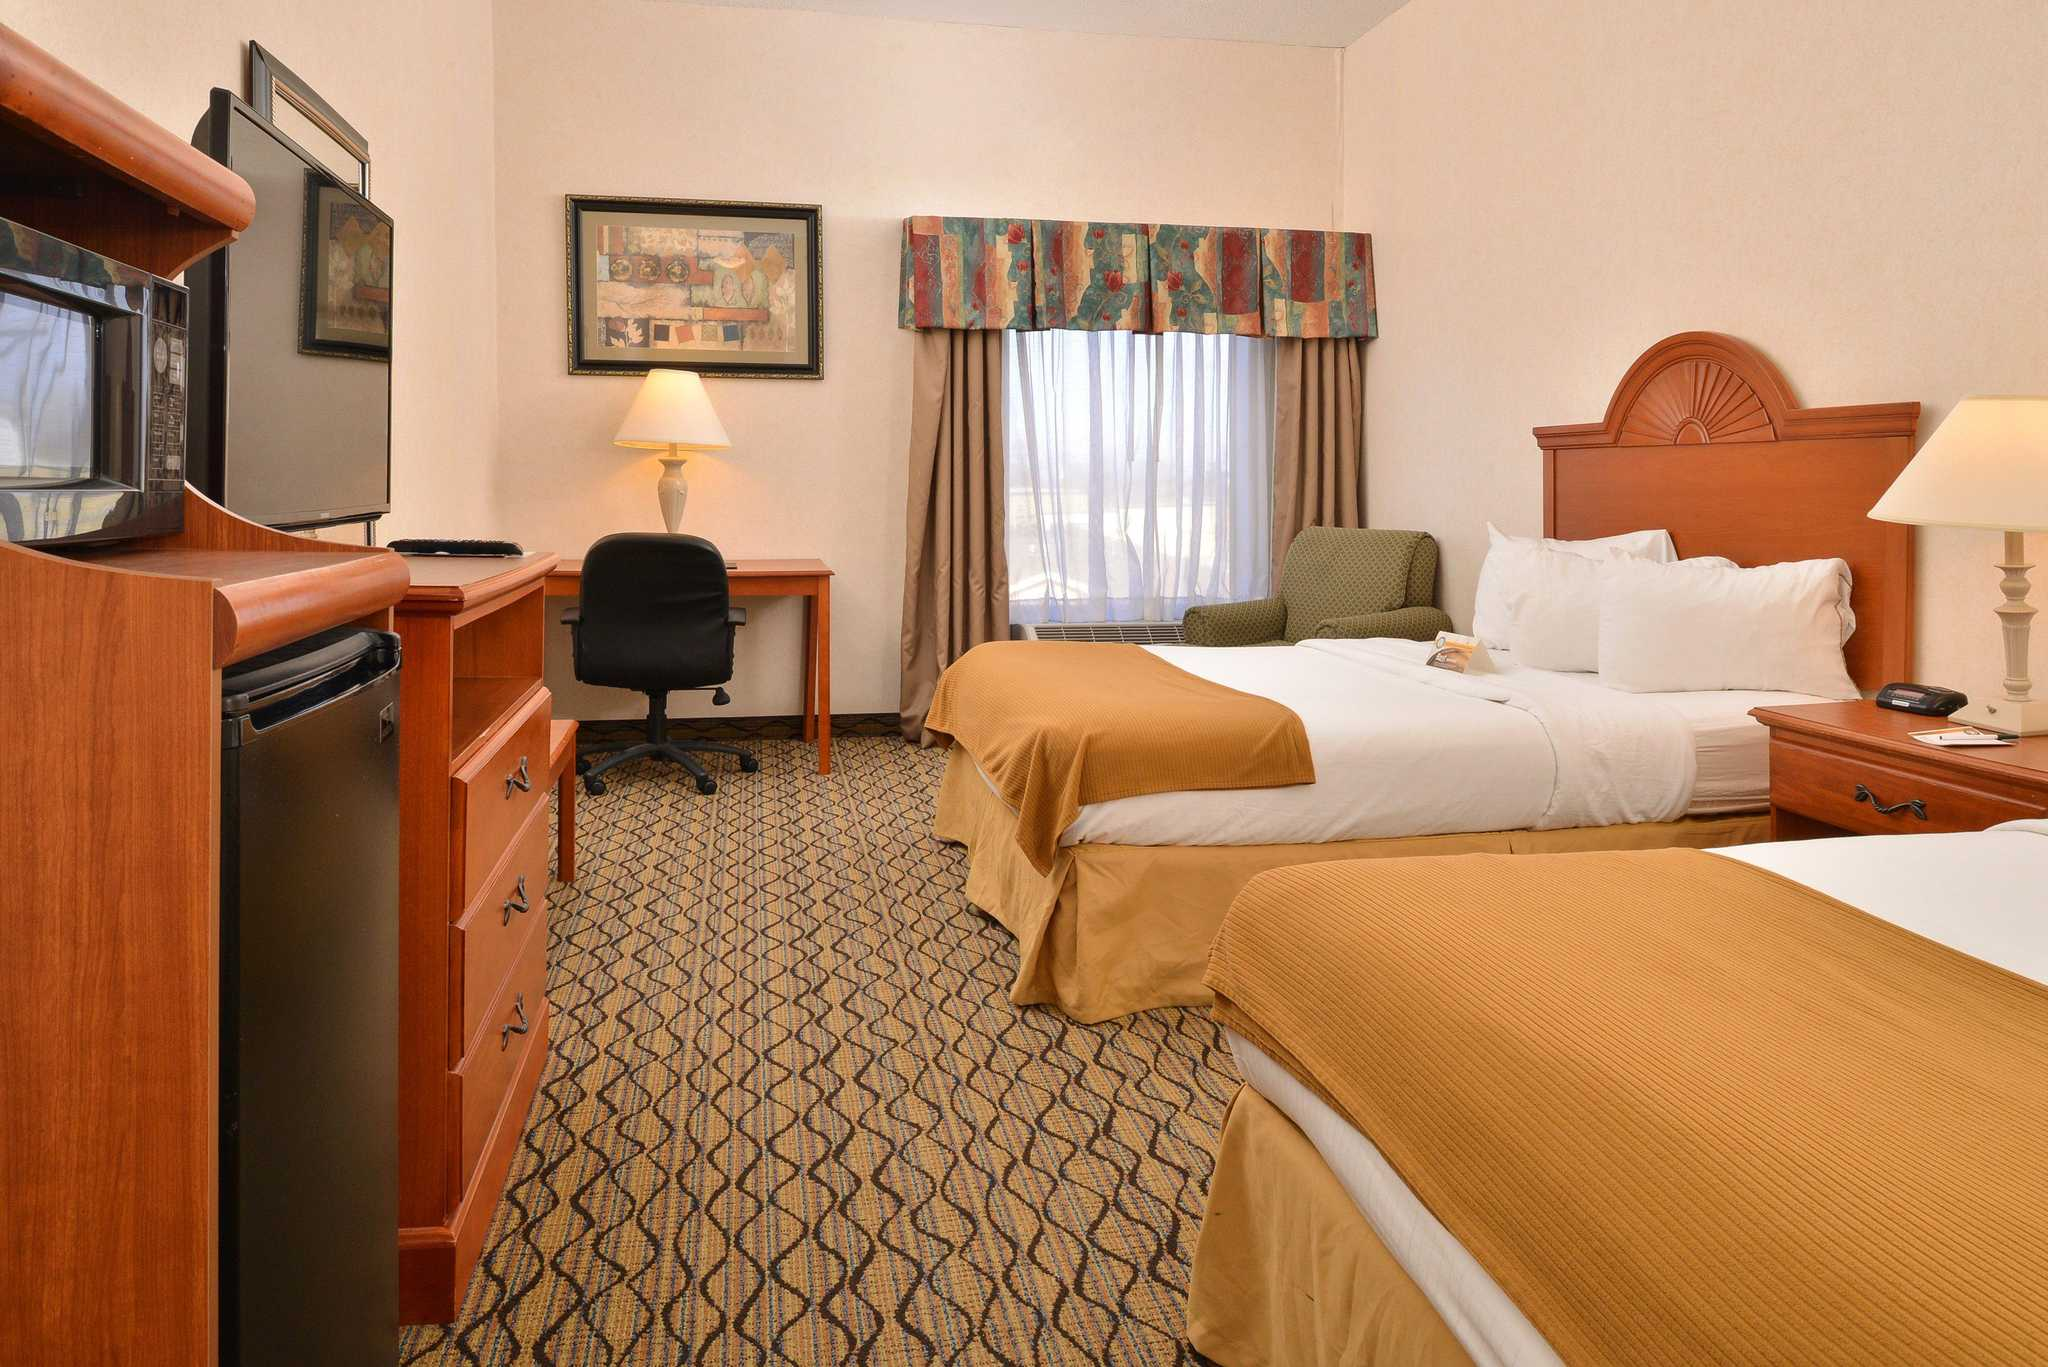 Quality Inn & Suites Jefferson City image 7